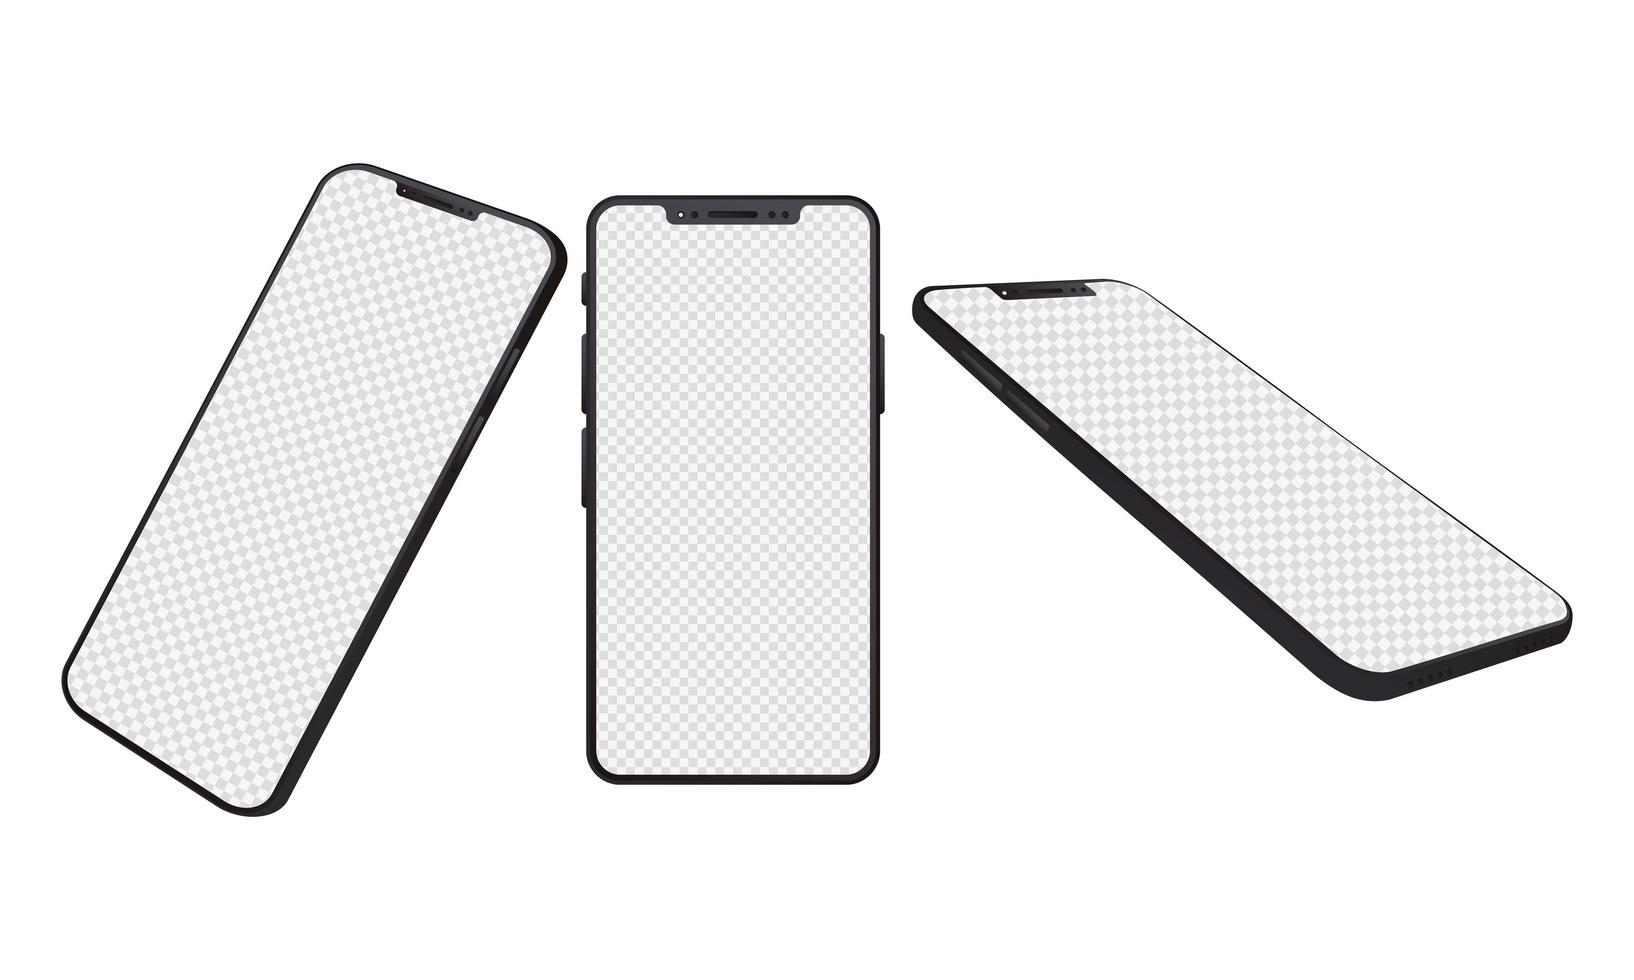 dispositifs de maquette de smartphone simples vecteur